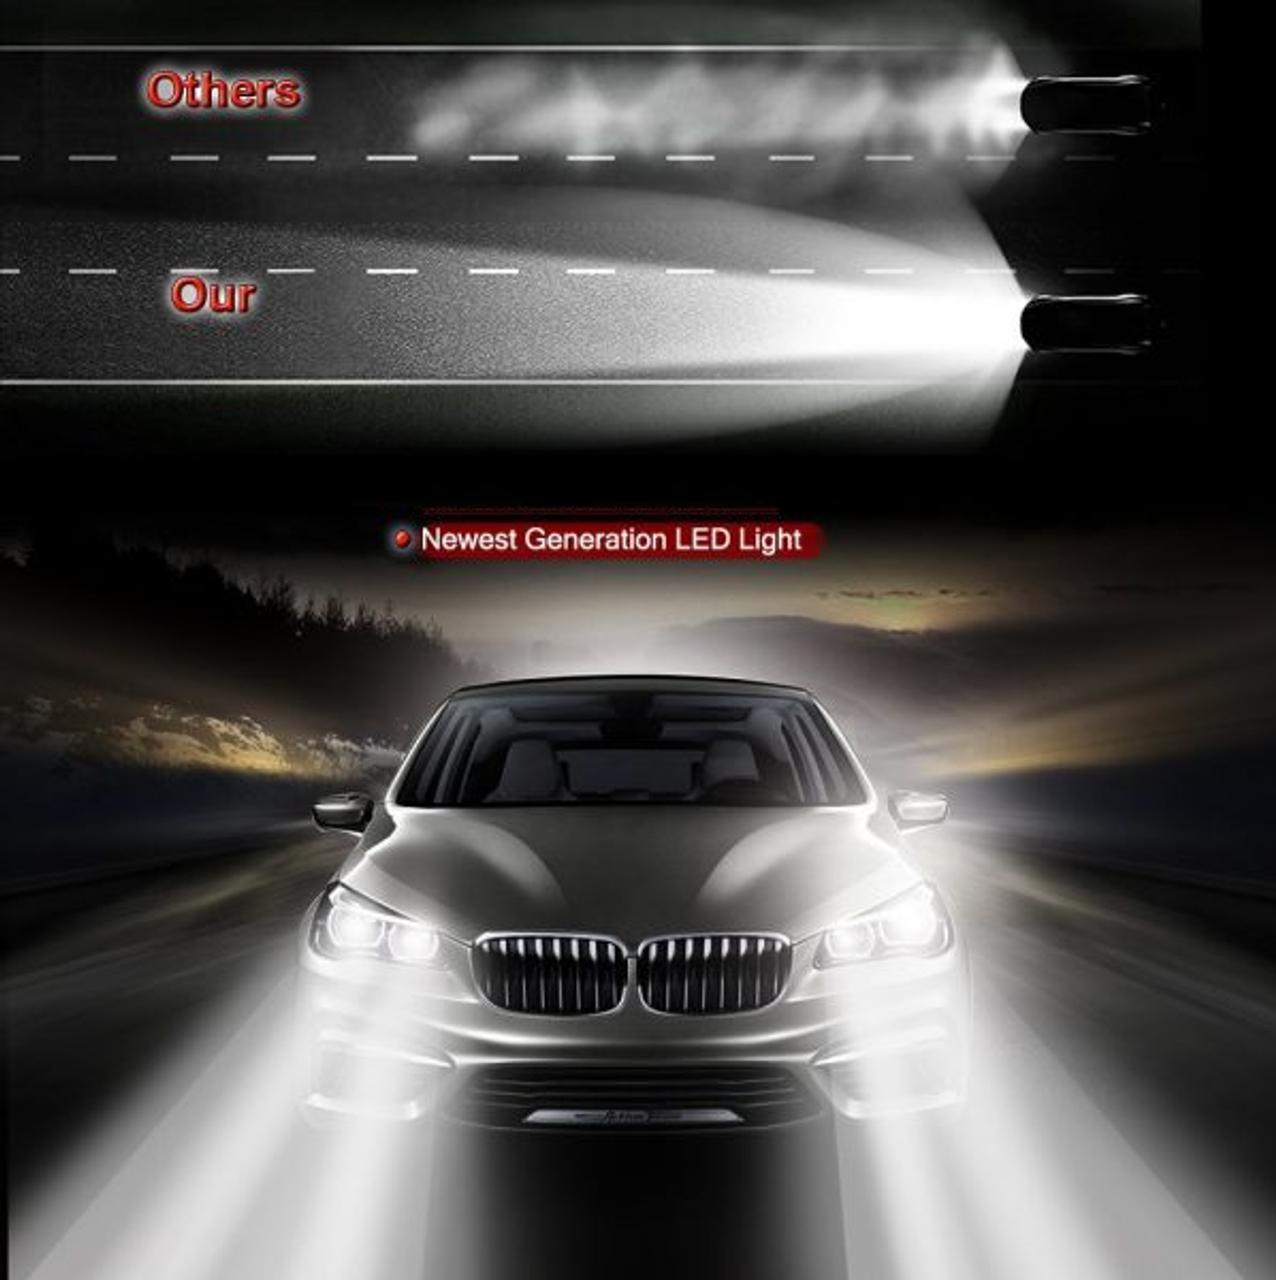 Radiator Cooling Fan For 2011-2013 Kia Sorento 2010-2012 Hyundai Santa Fe